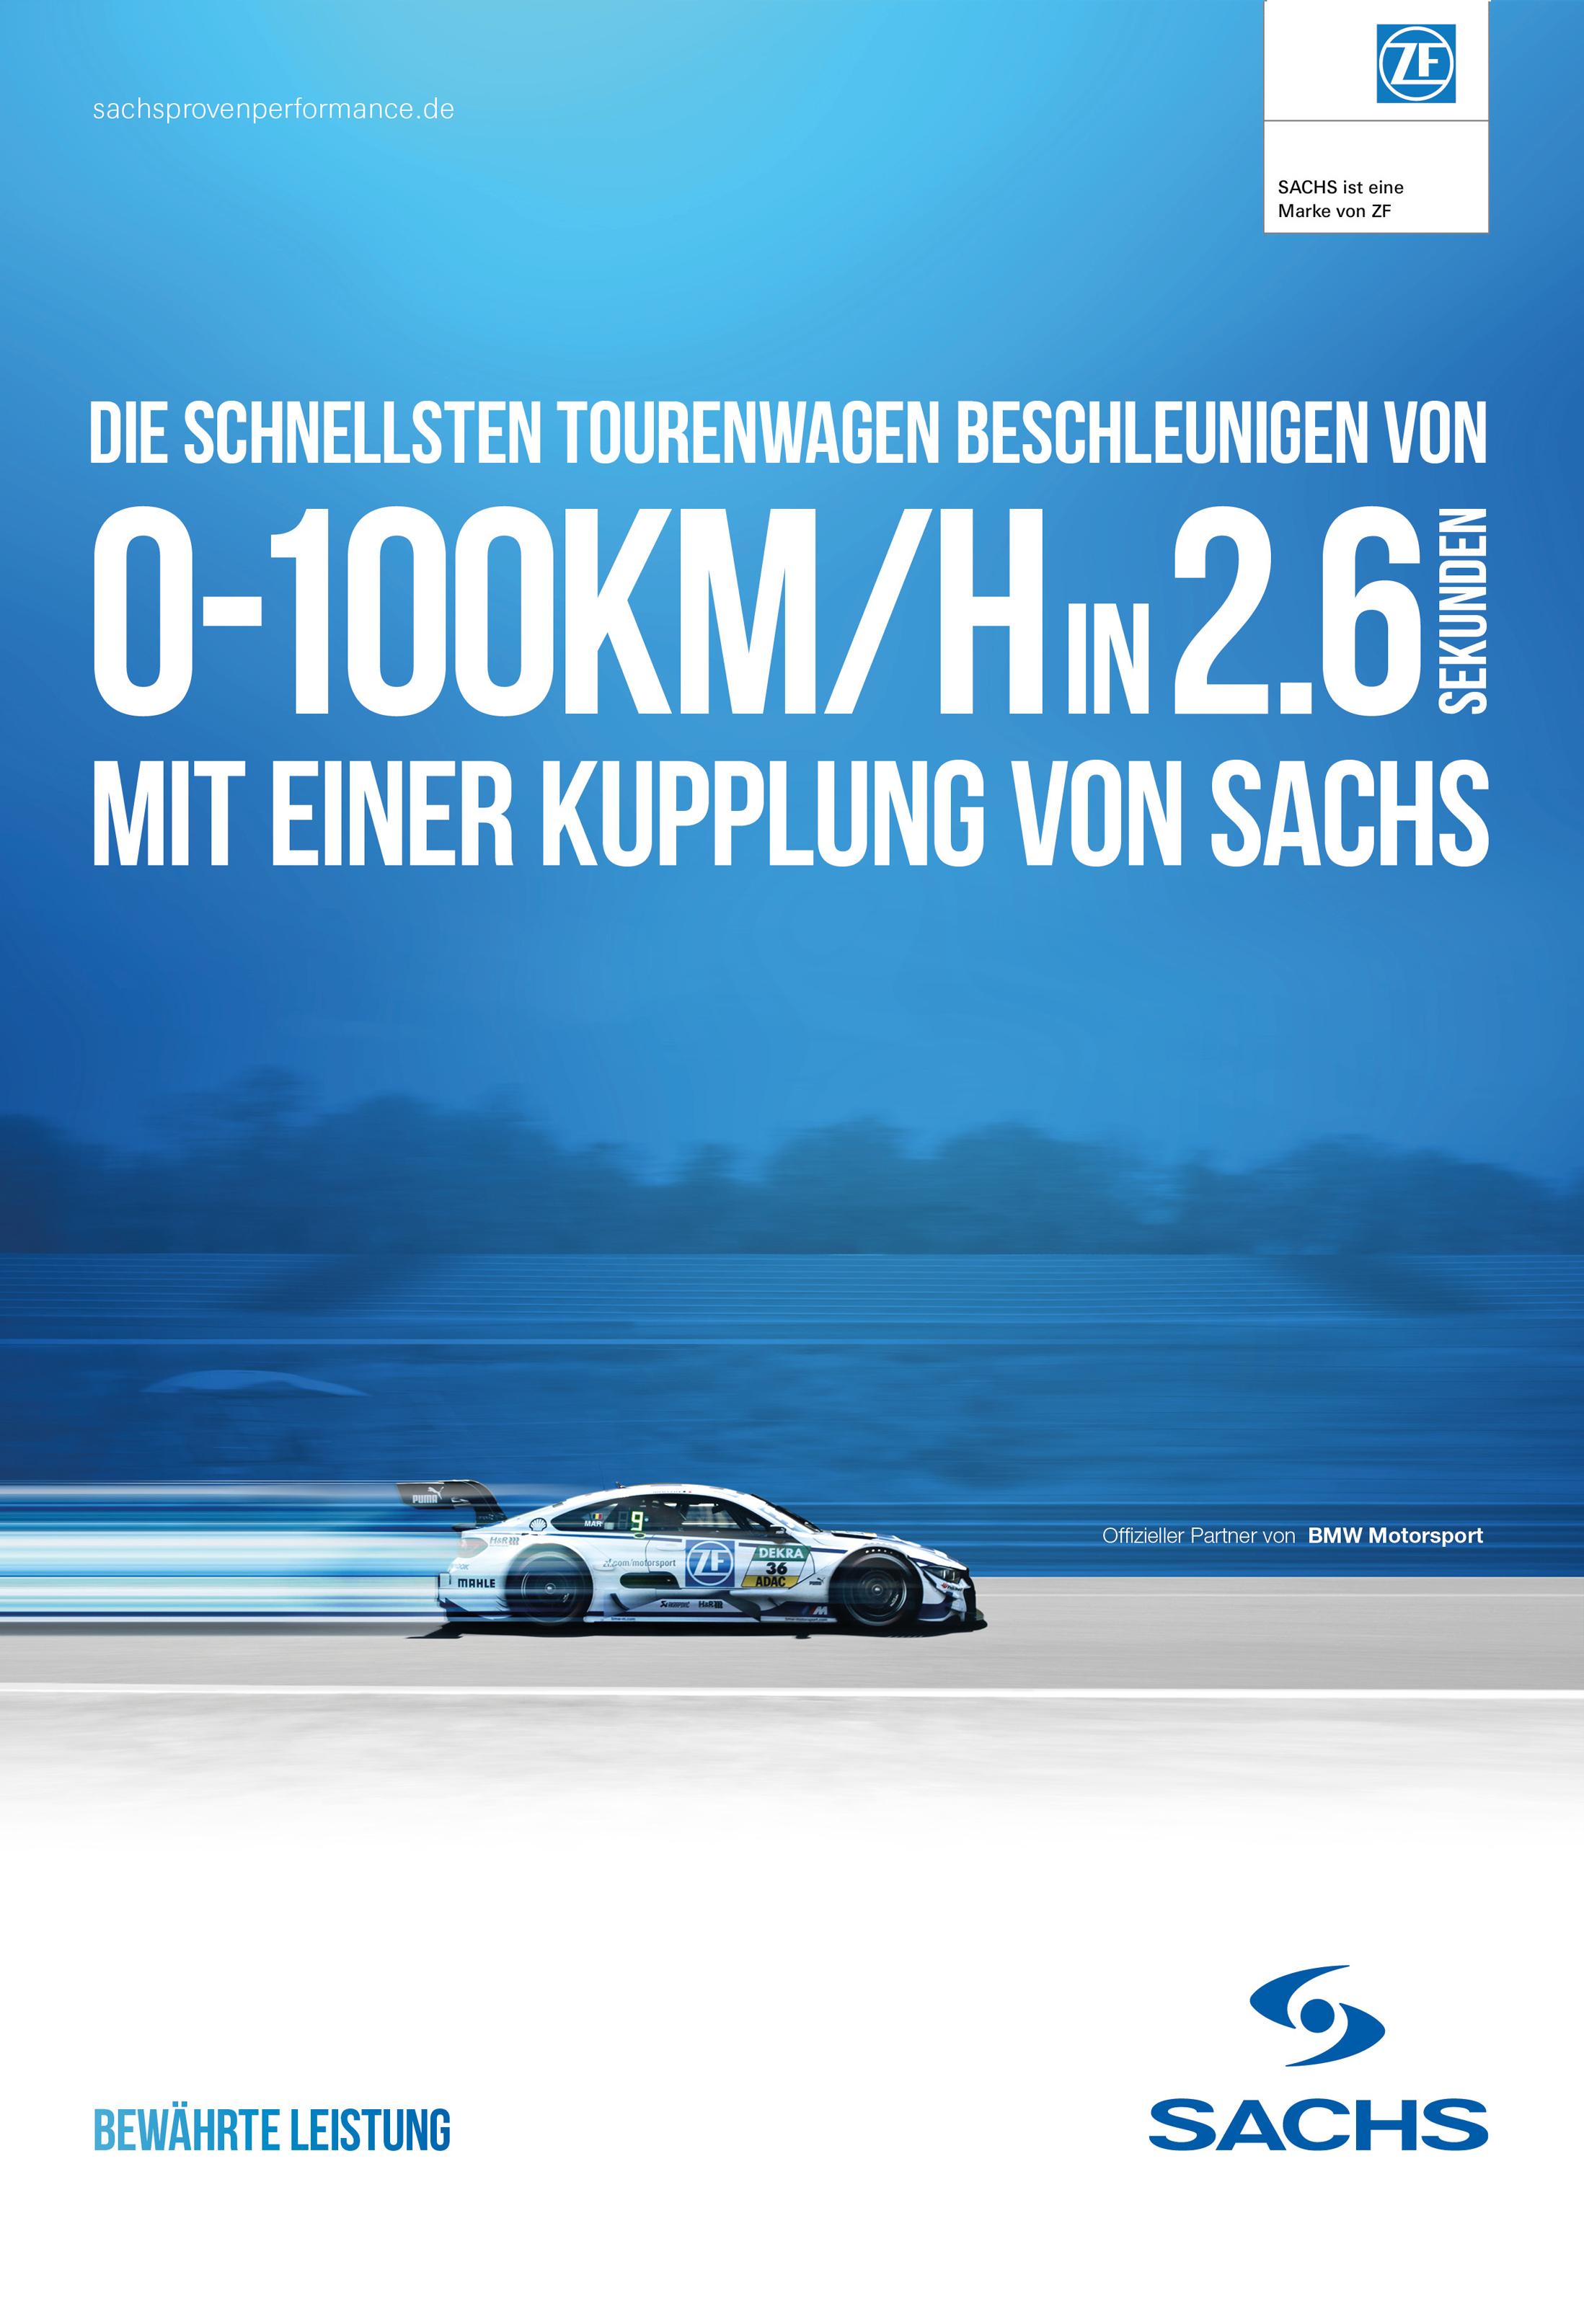 SACHS_DTM_A4_GERMAN1